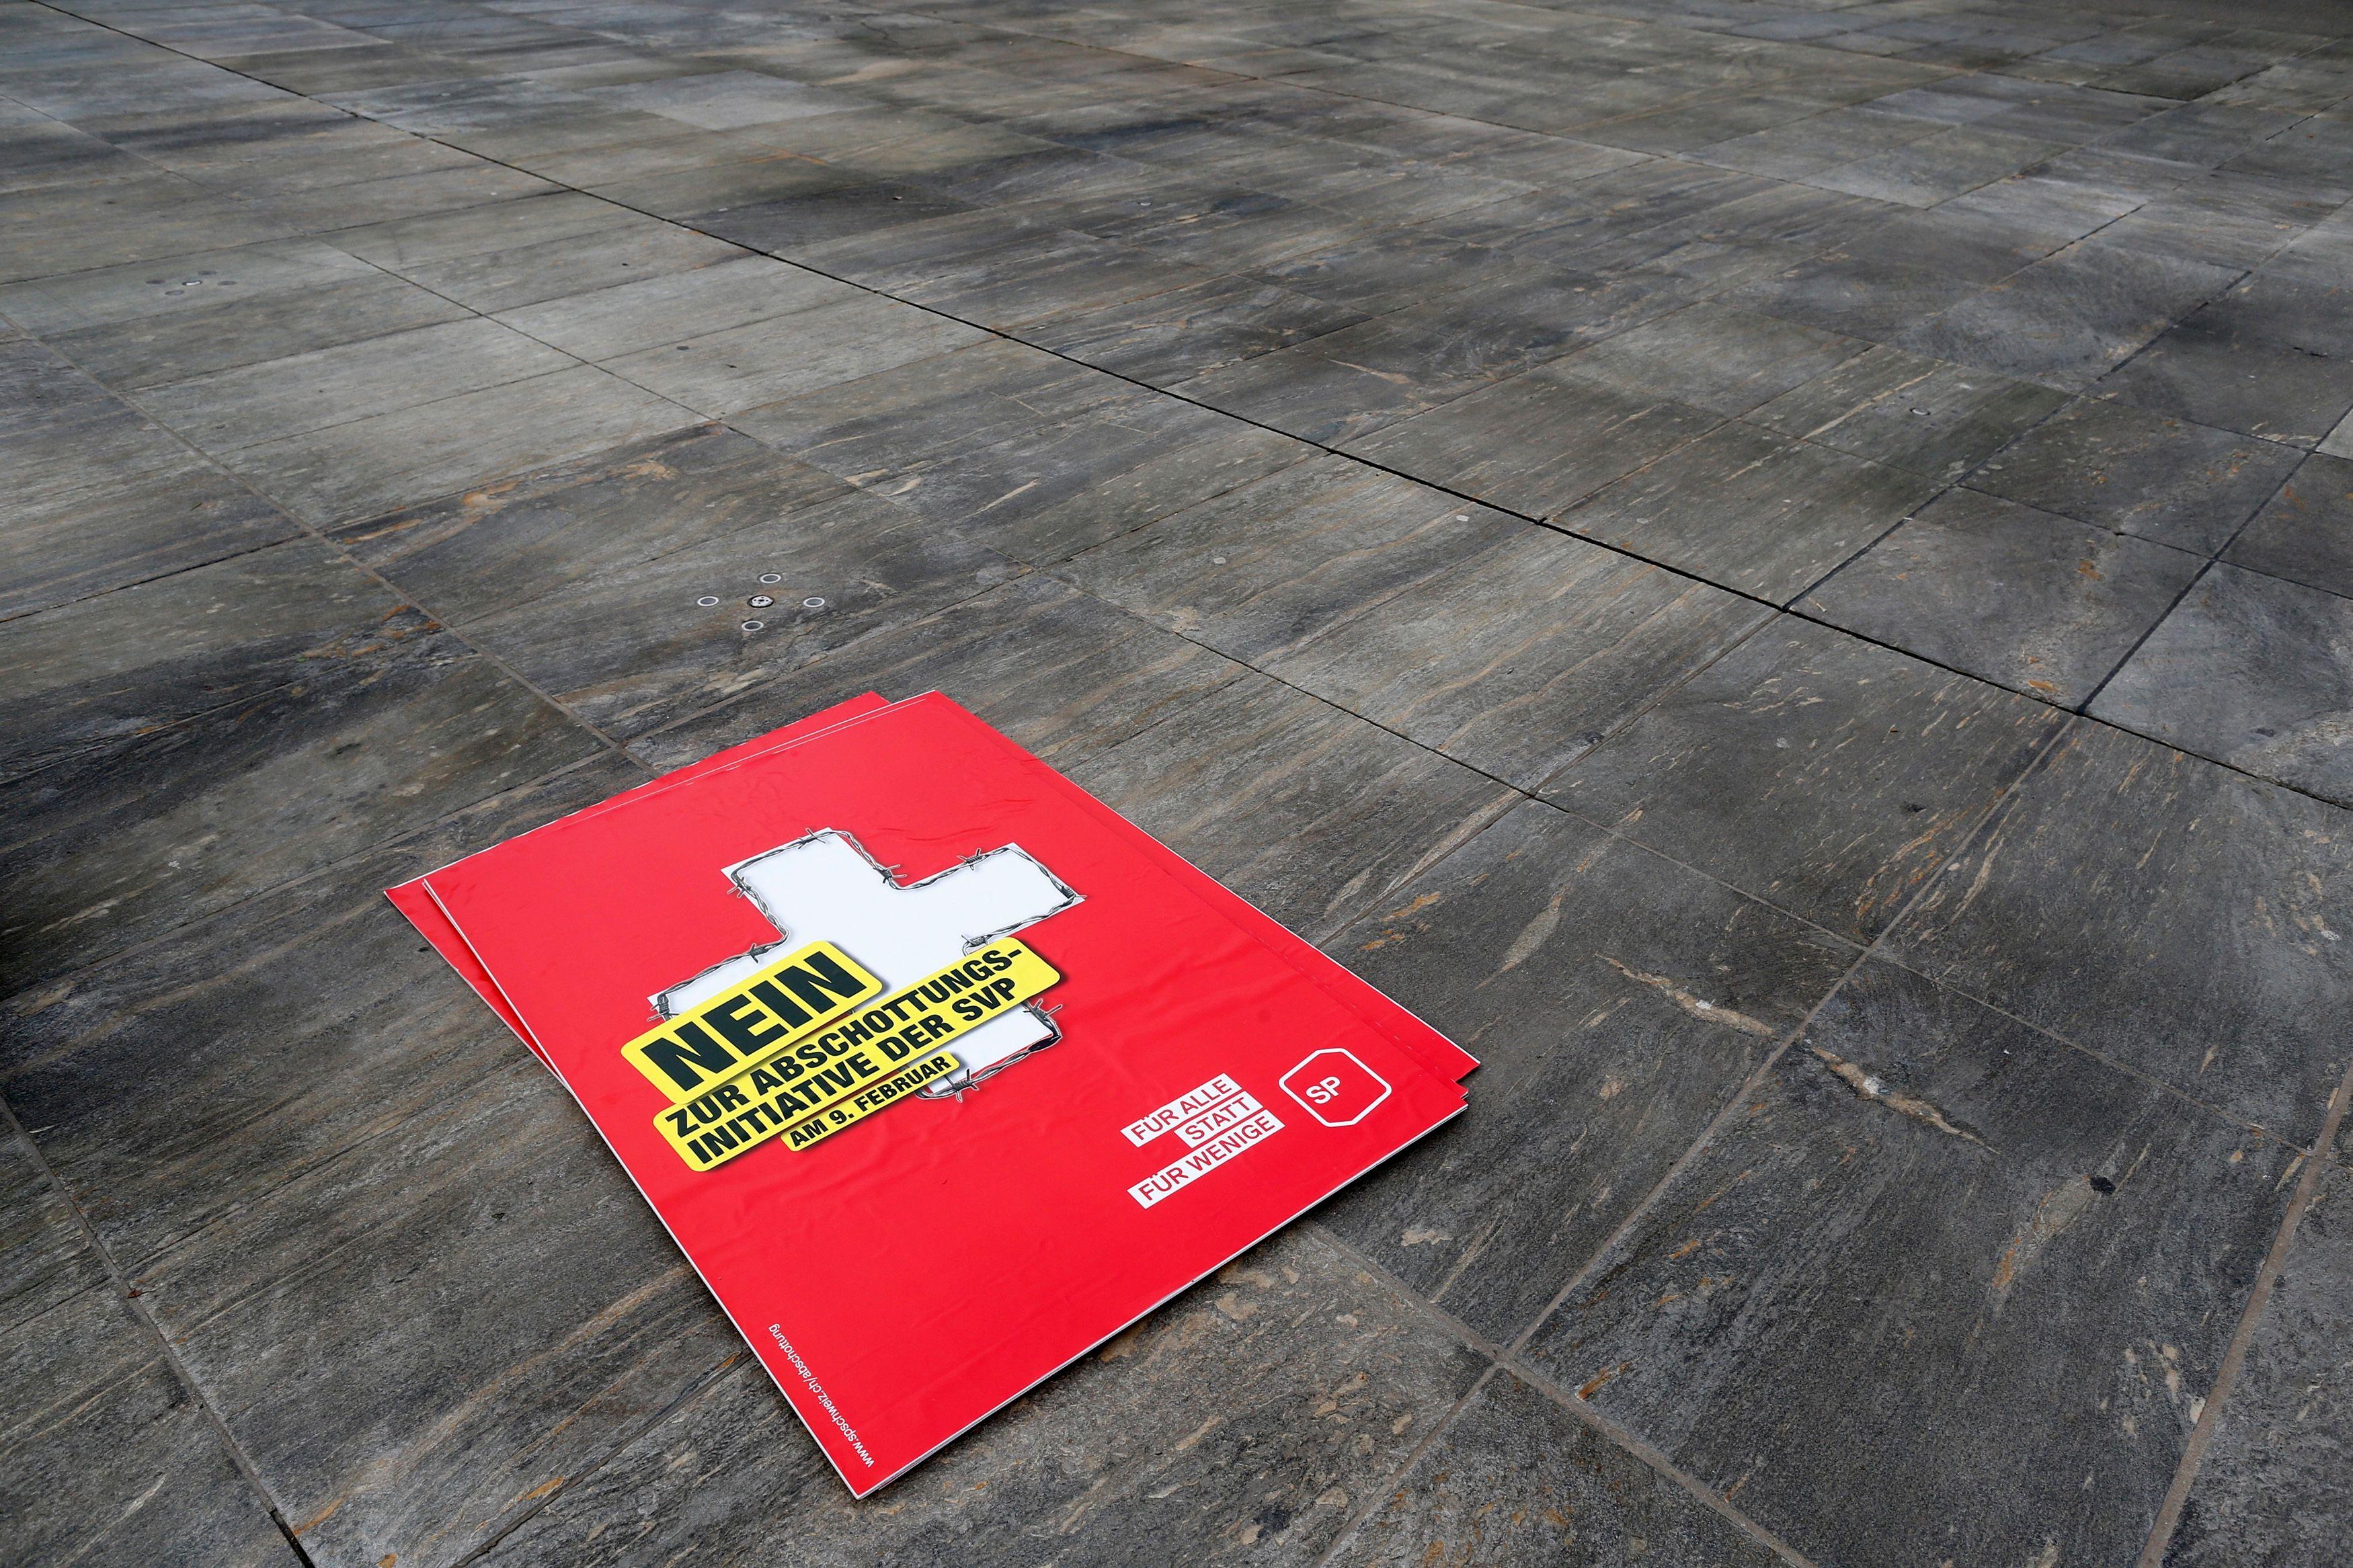 Affiche suisse anti-immigration massive.